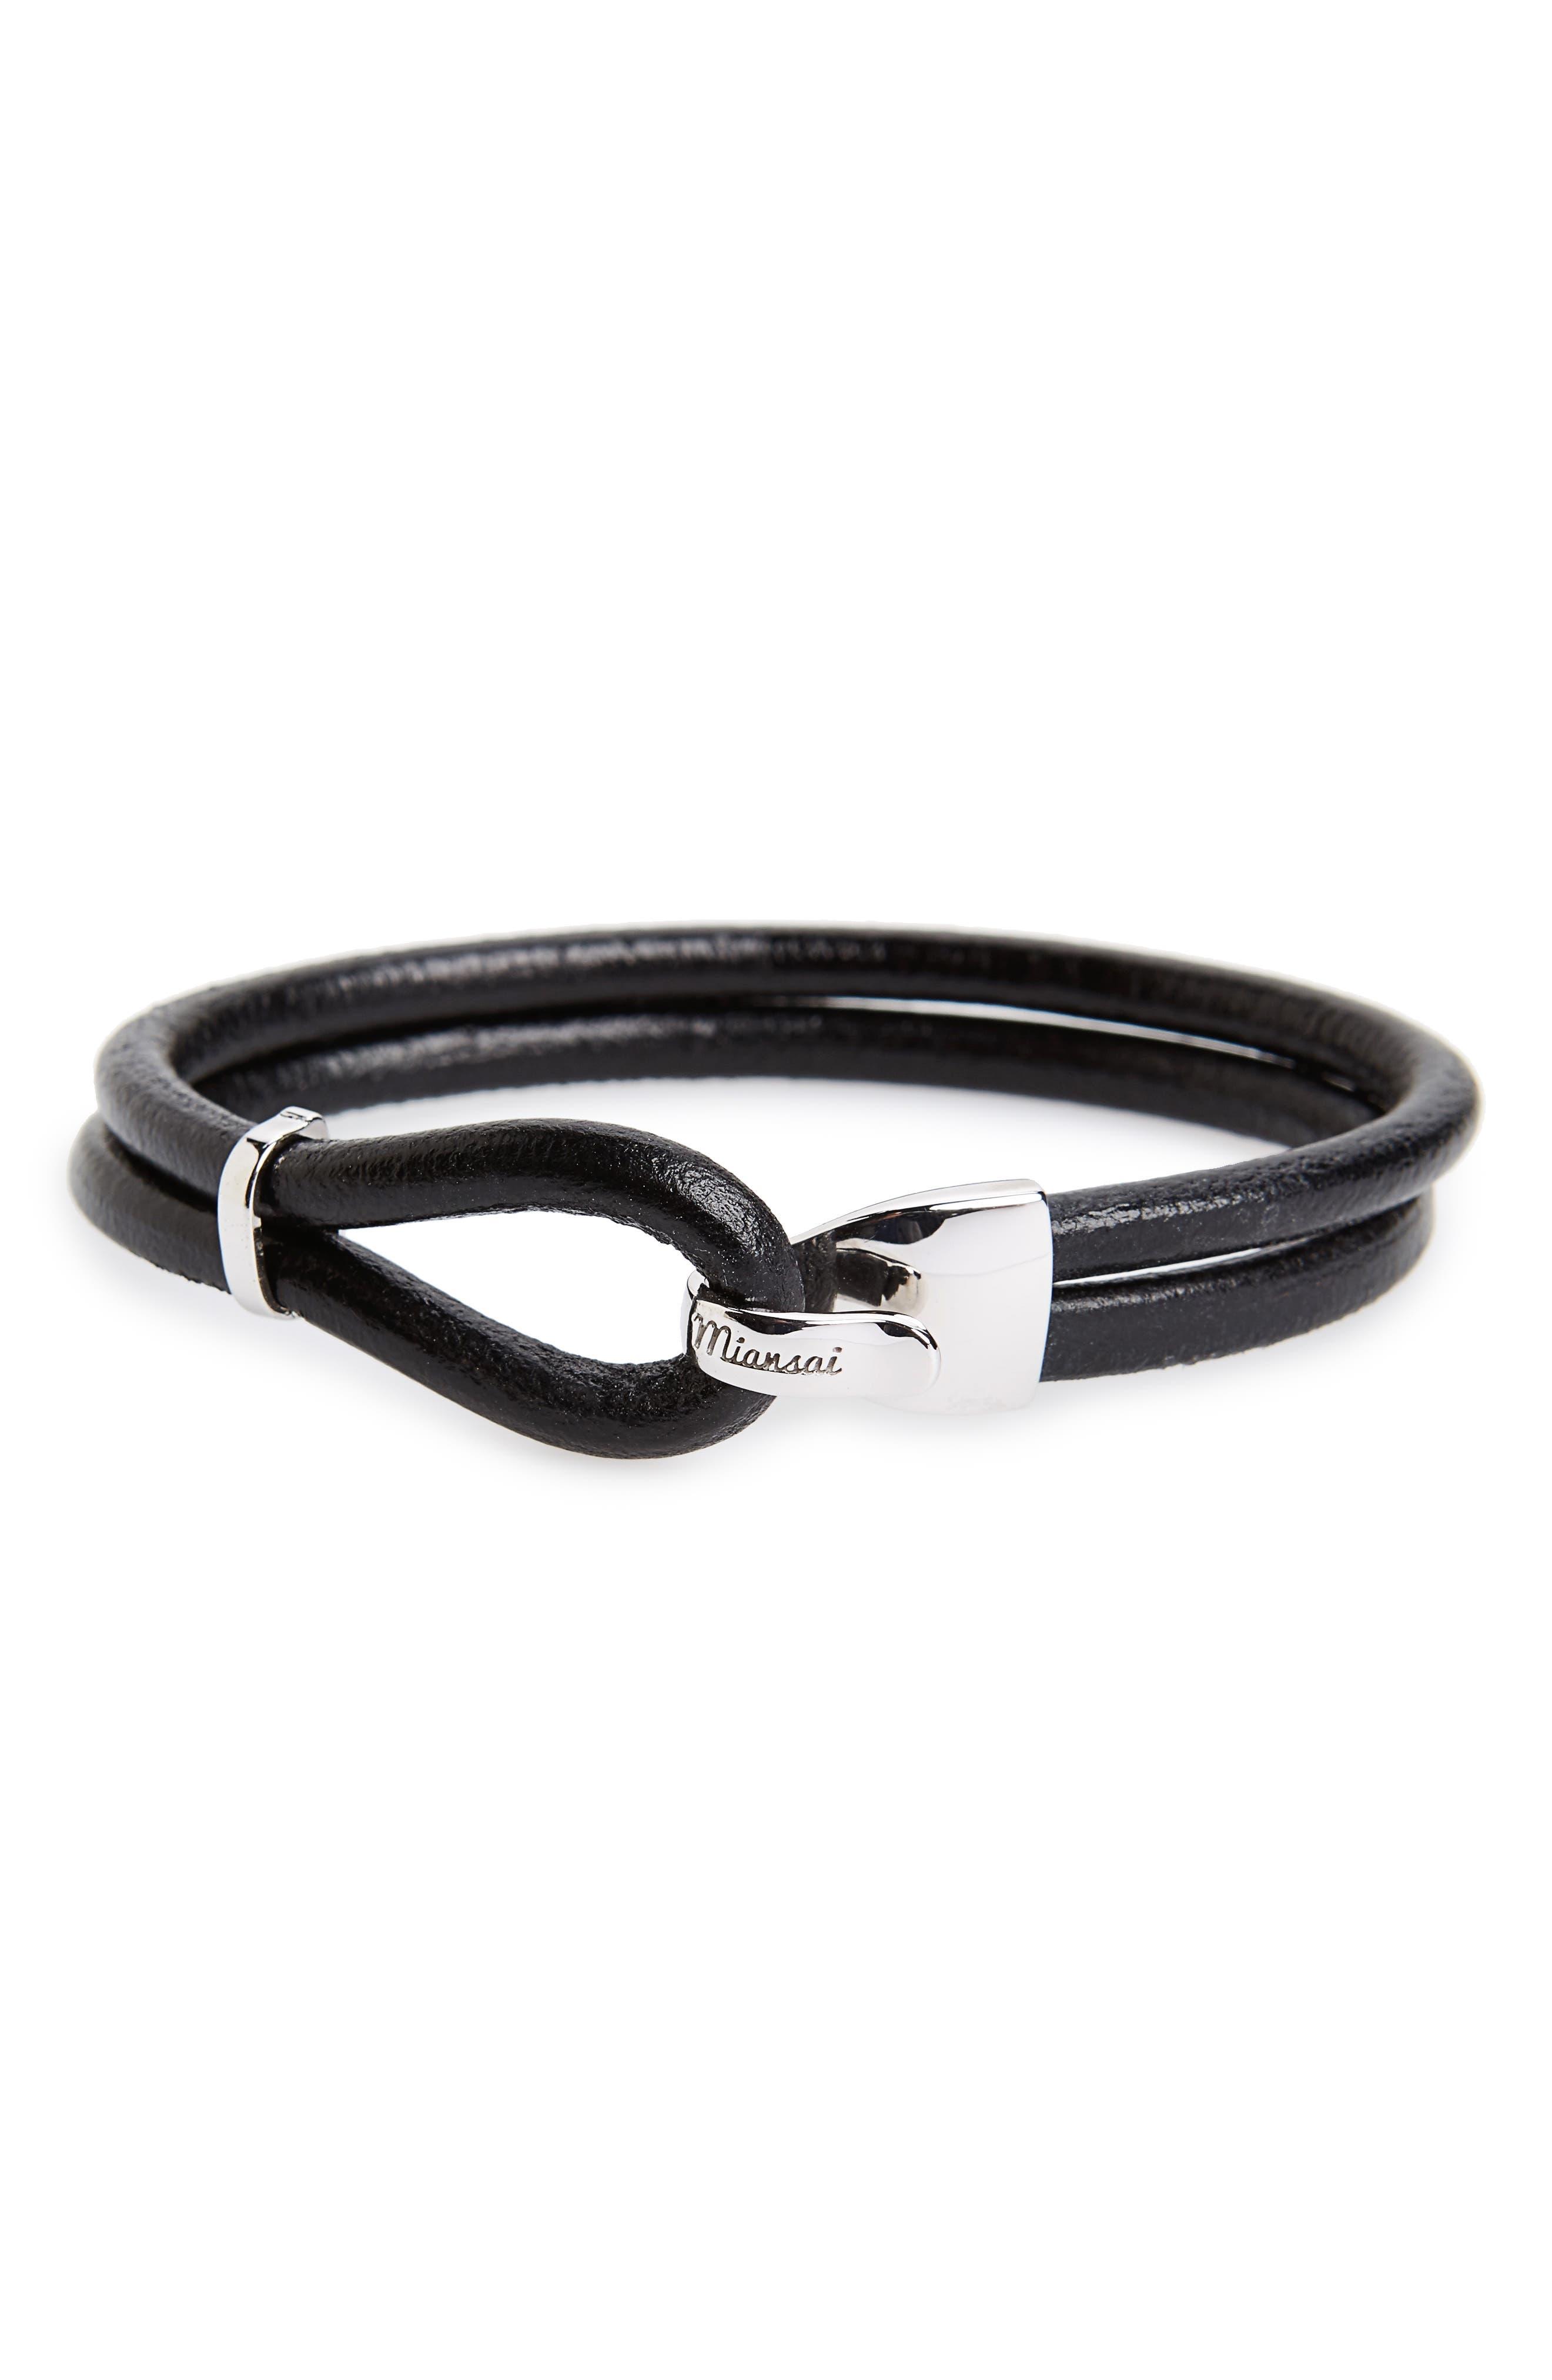 Beacon Leather Bracelet,                             Main thumbnail 1, color,                             012